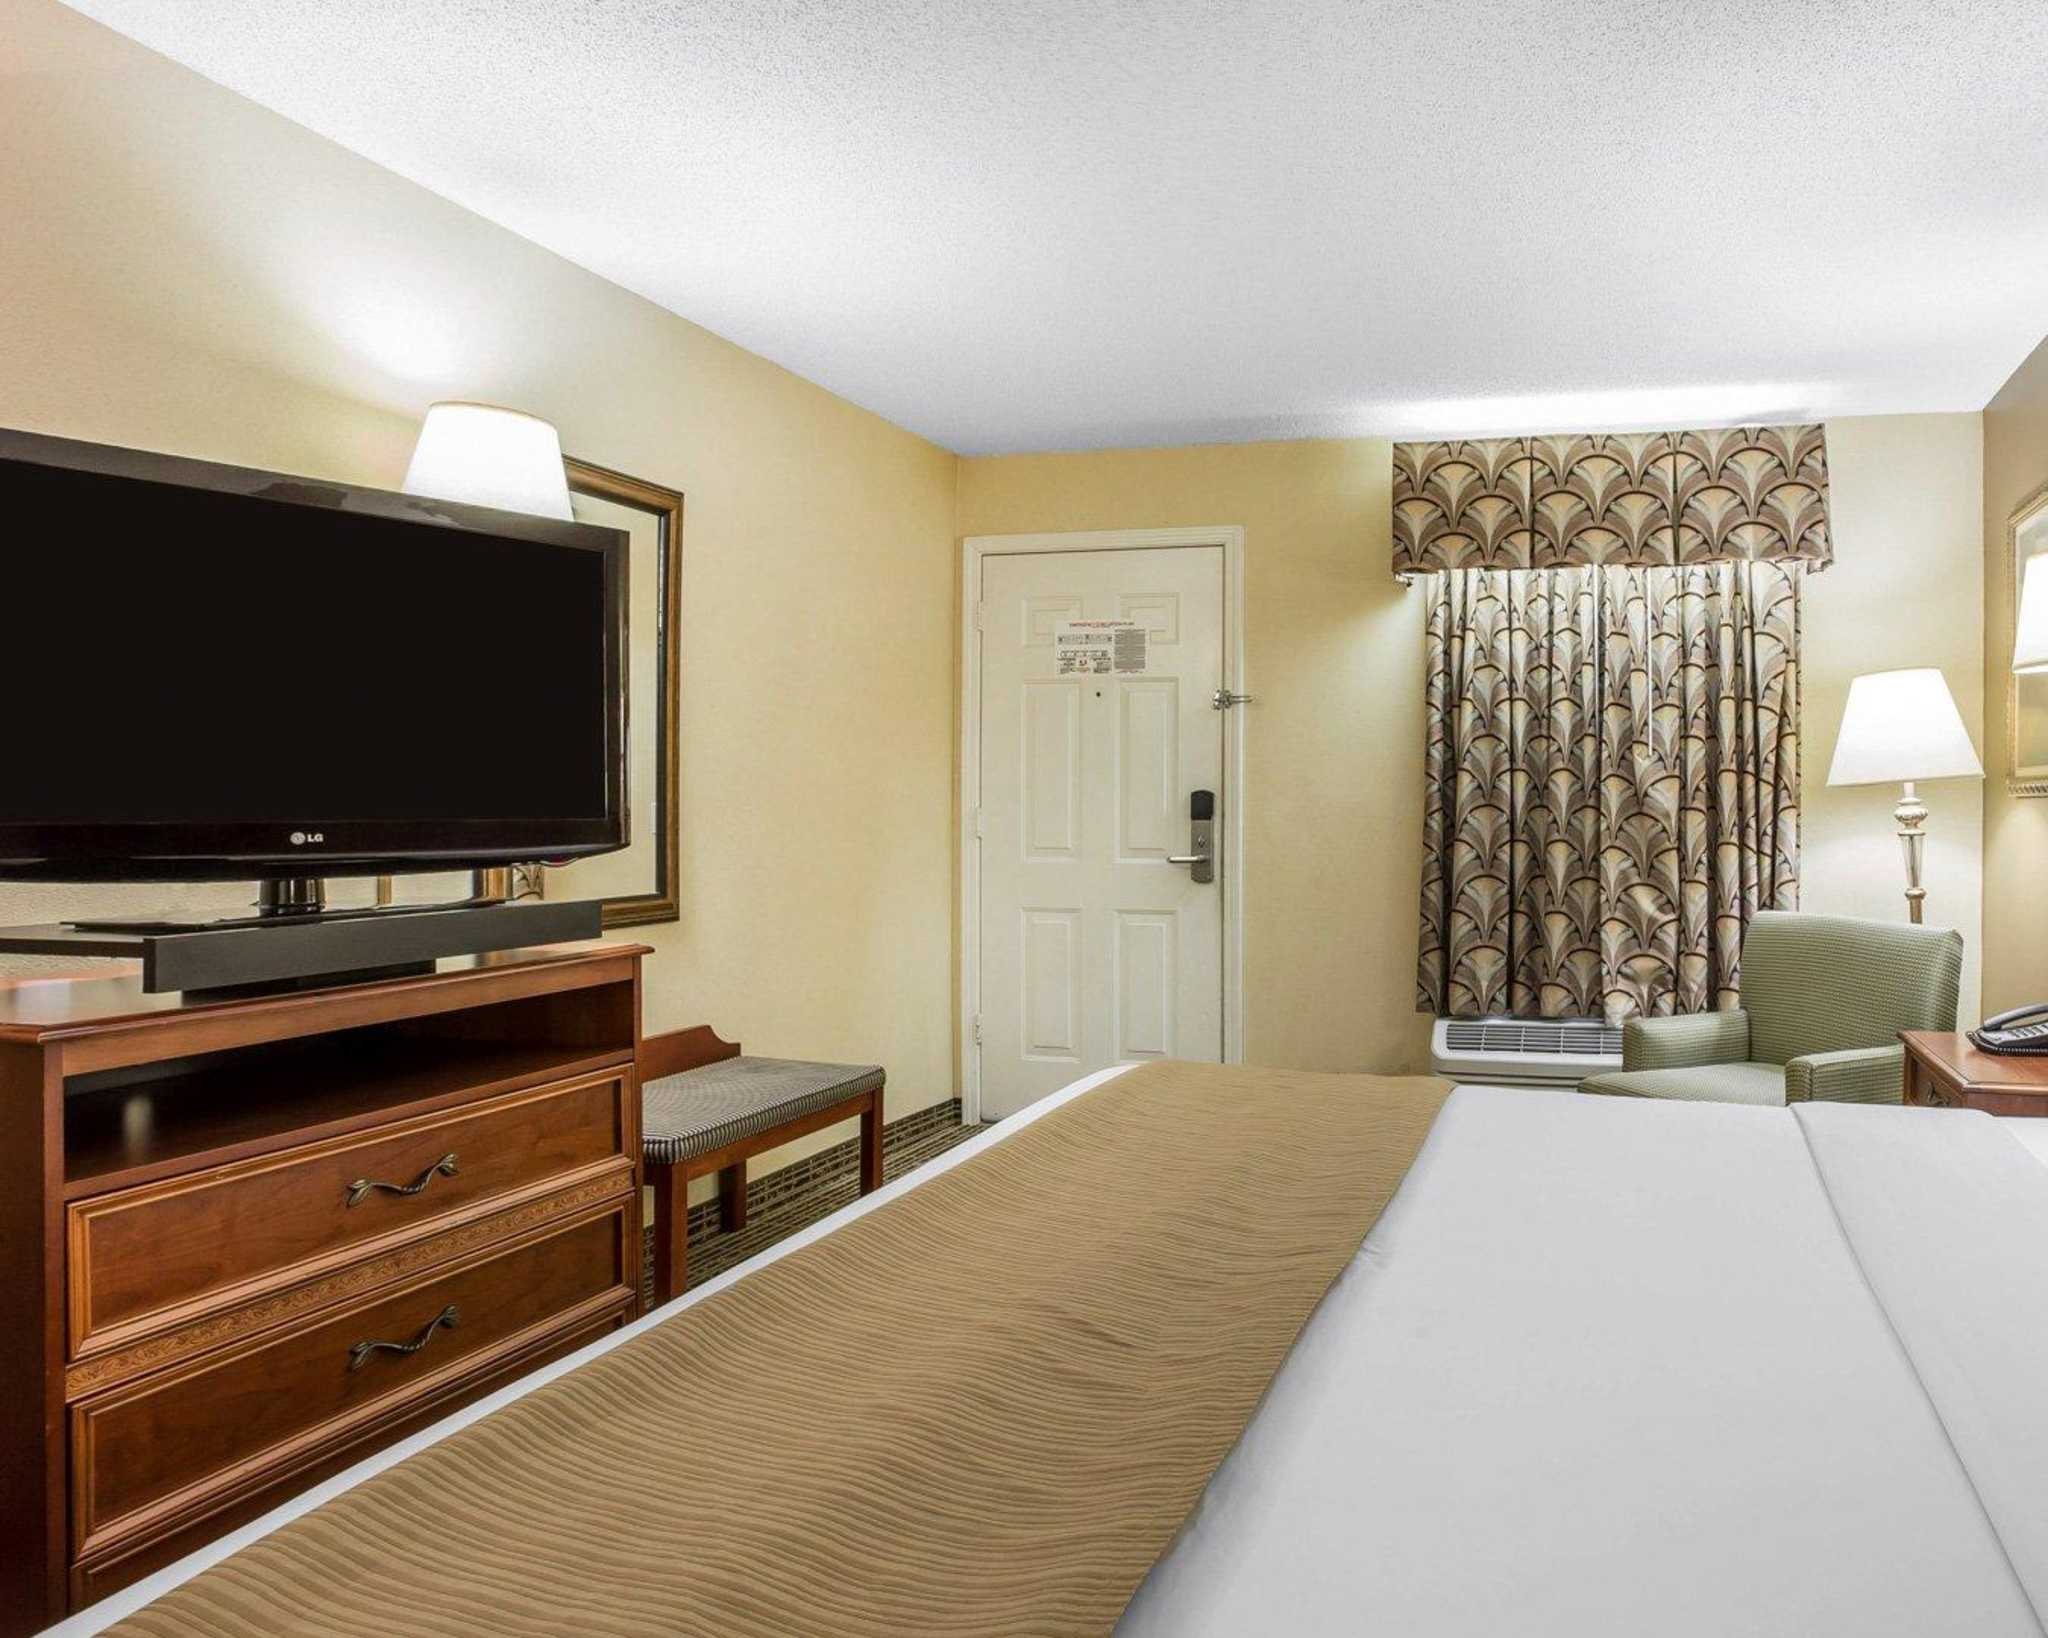 Quality Inn image 12